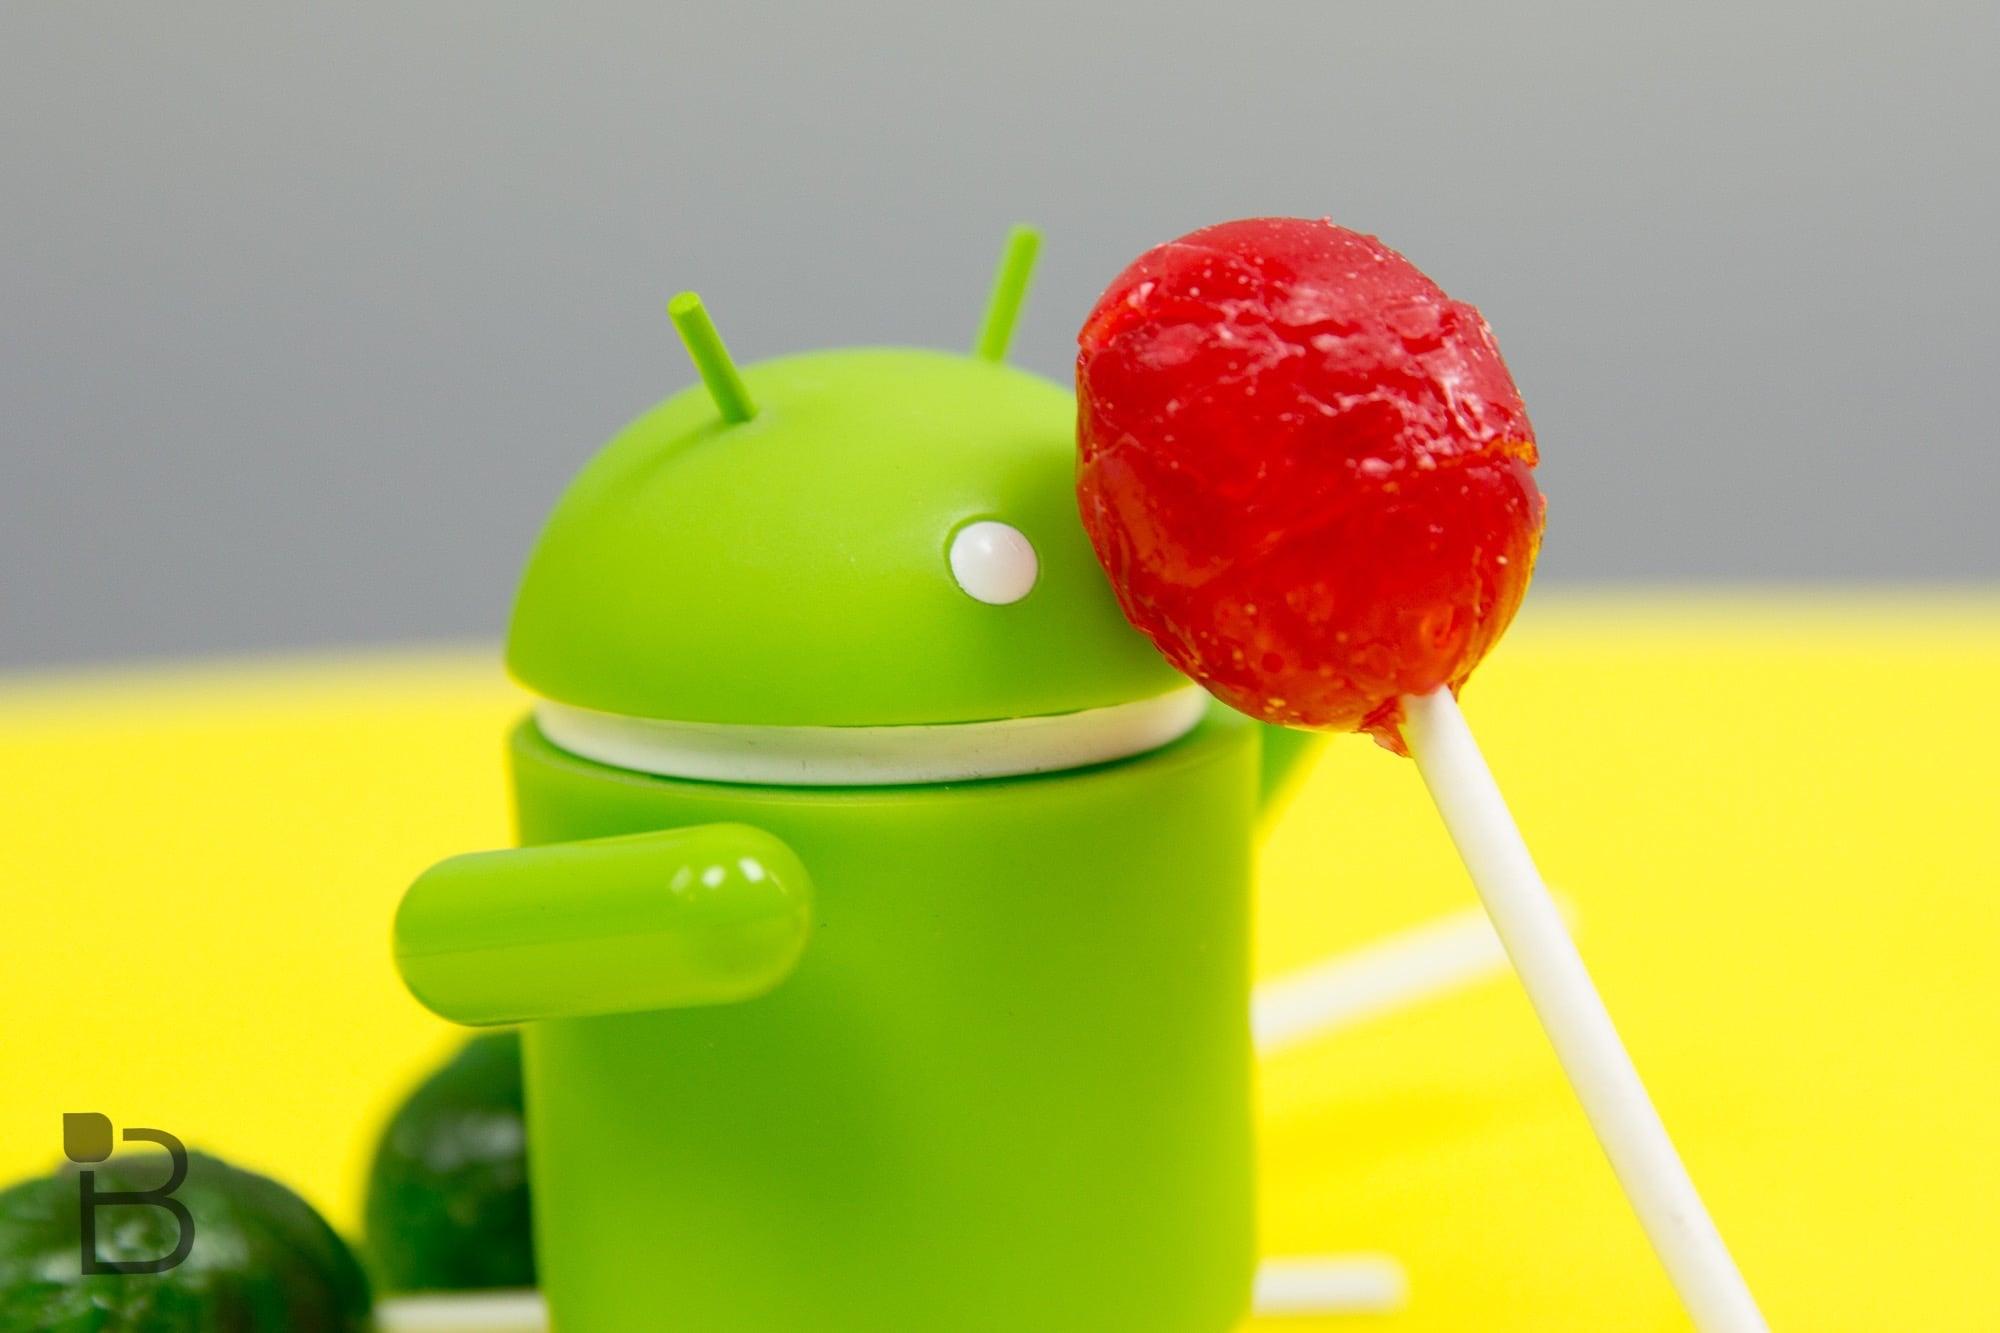 Android Cihazlara Çoklu Ekran